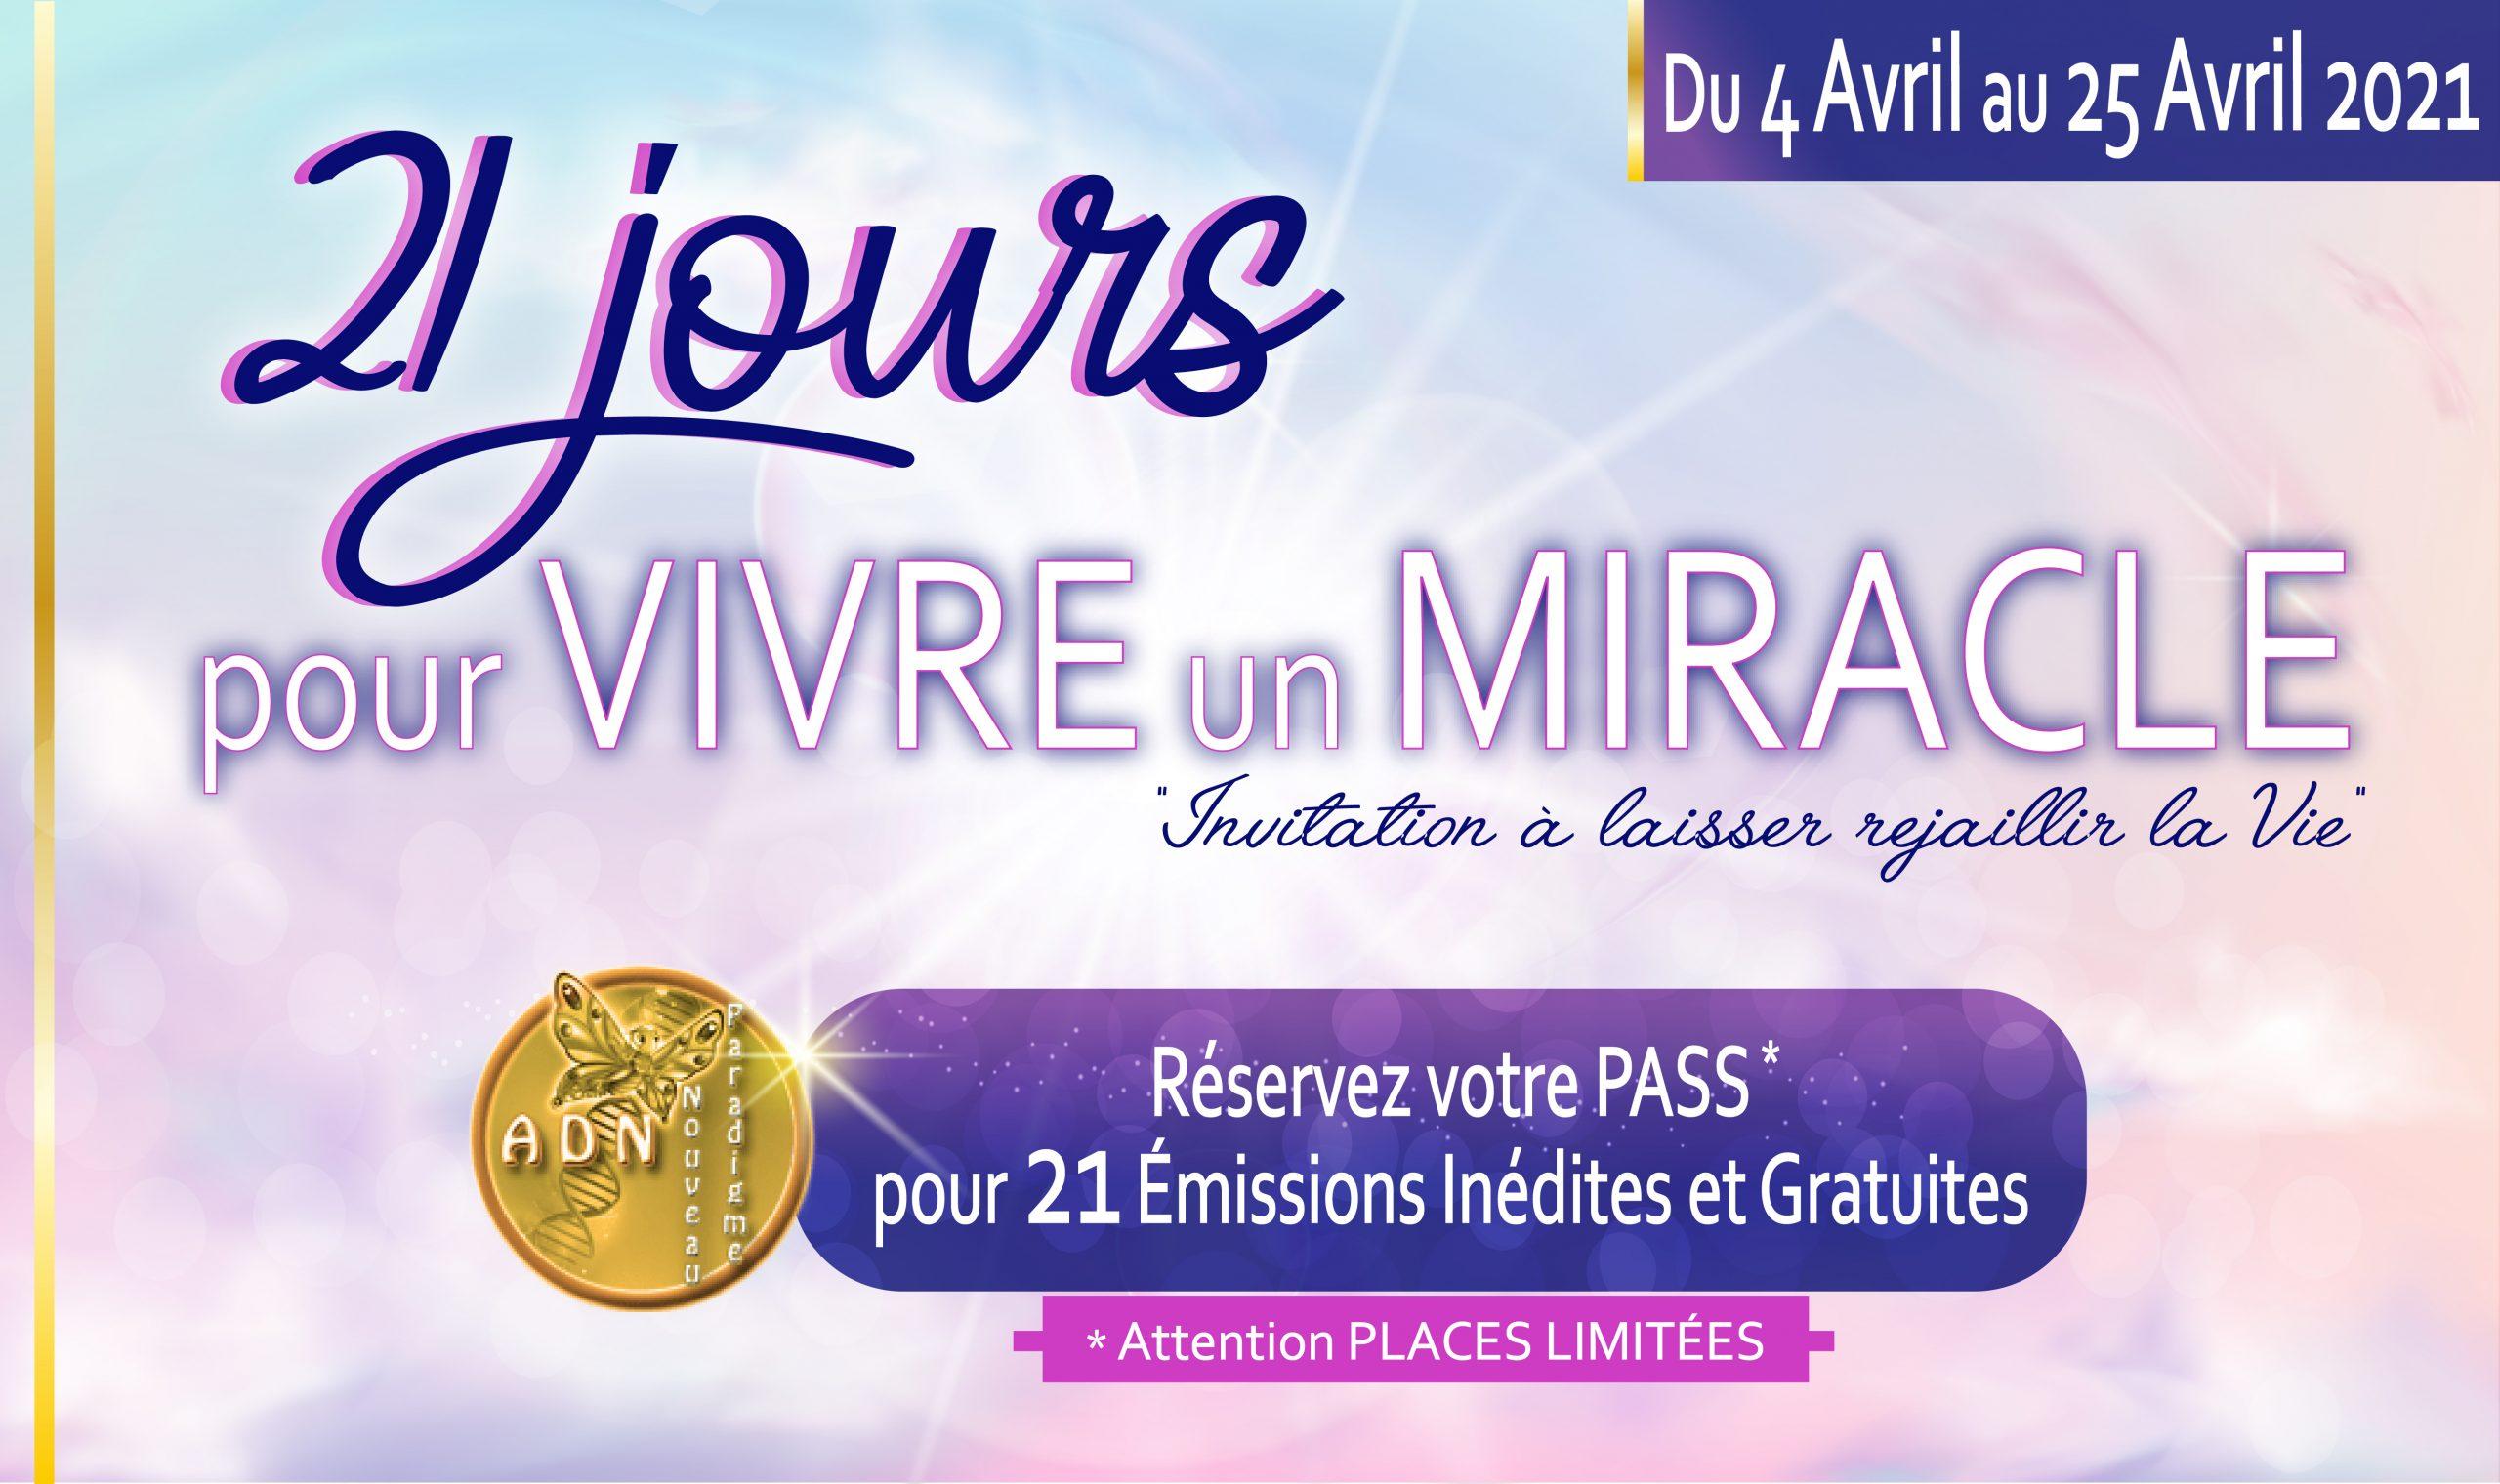 VIGNETTE Sommet 21 Jrs MIRACLE